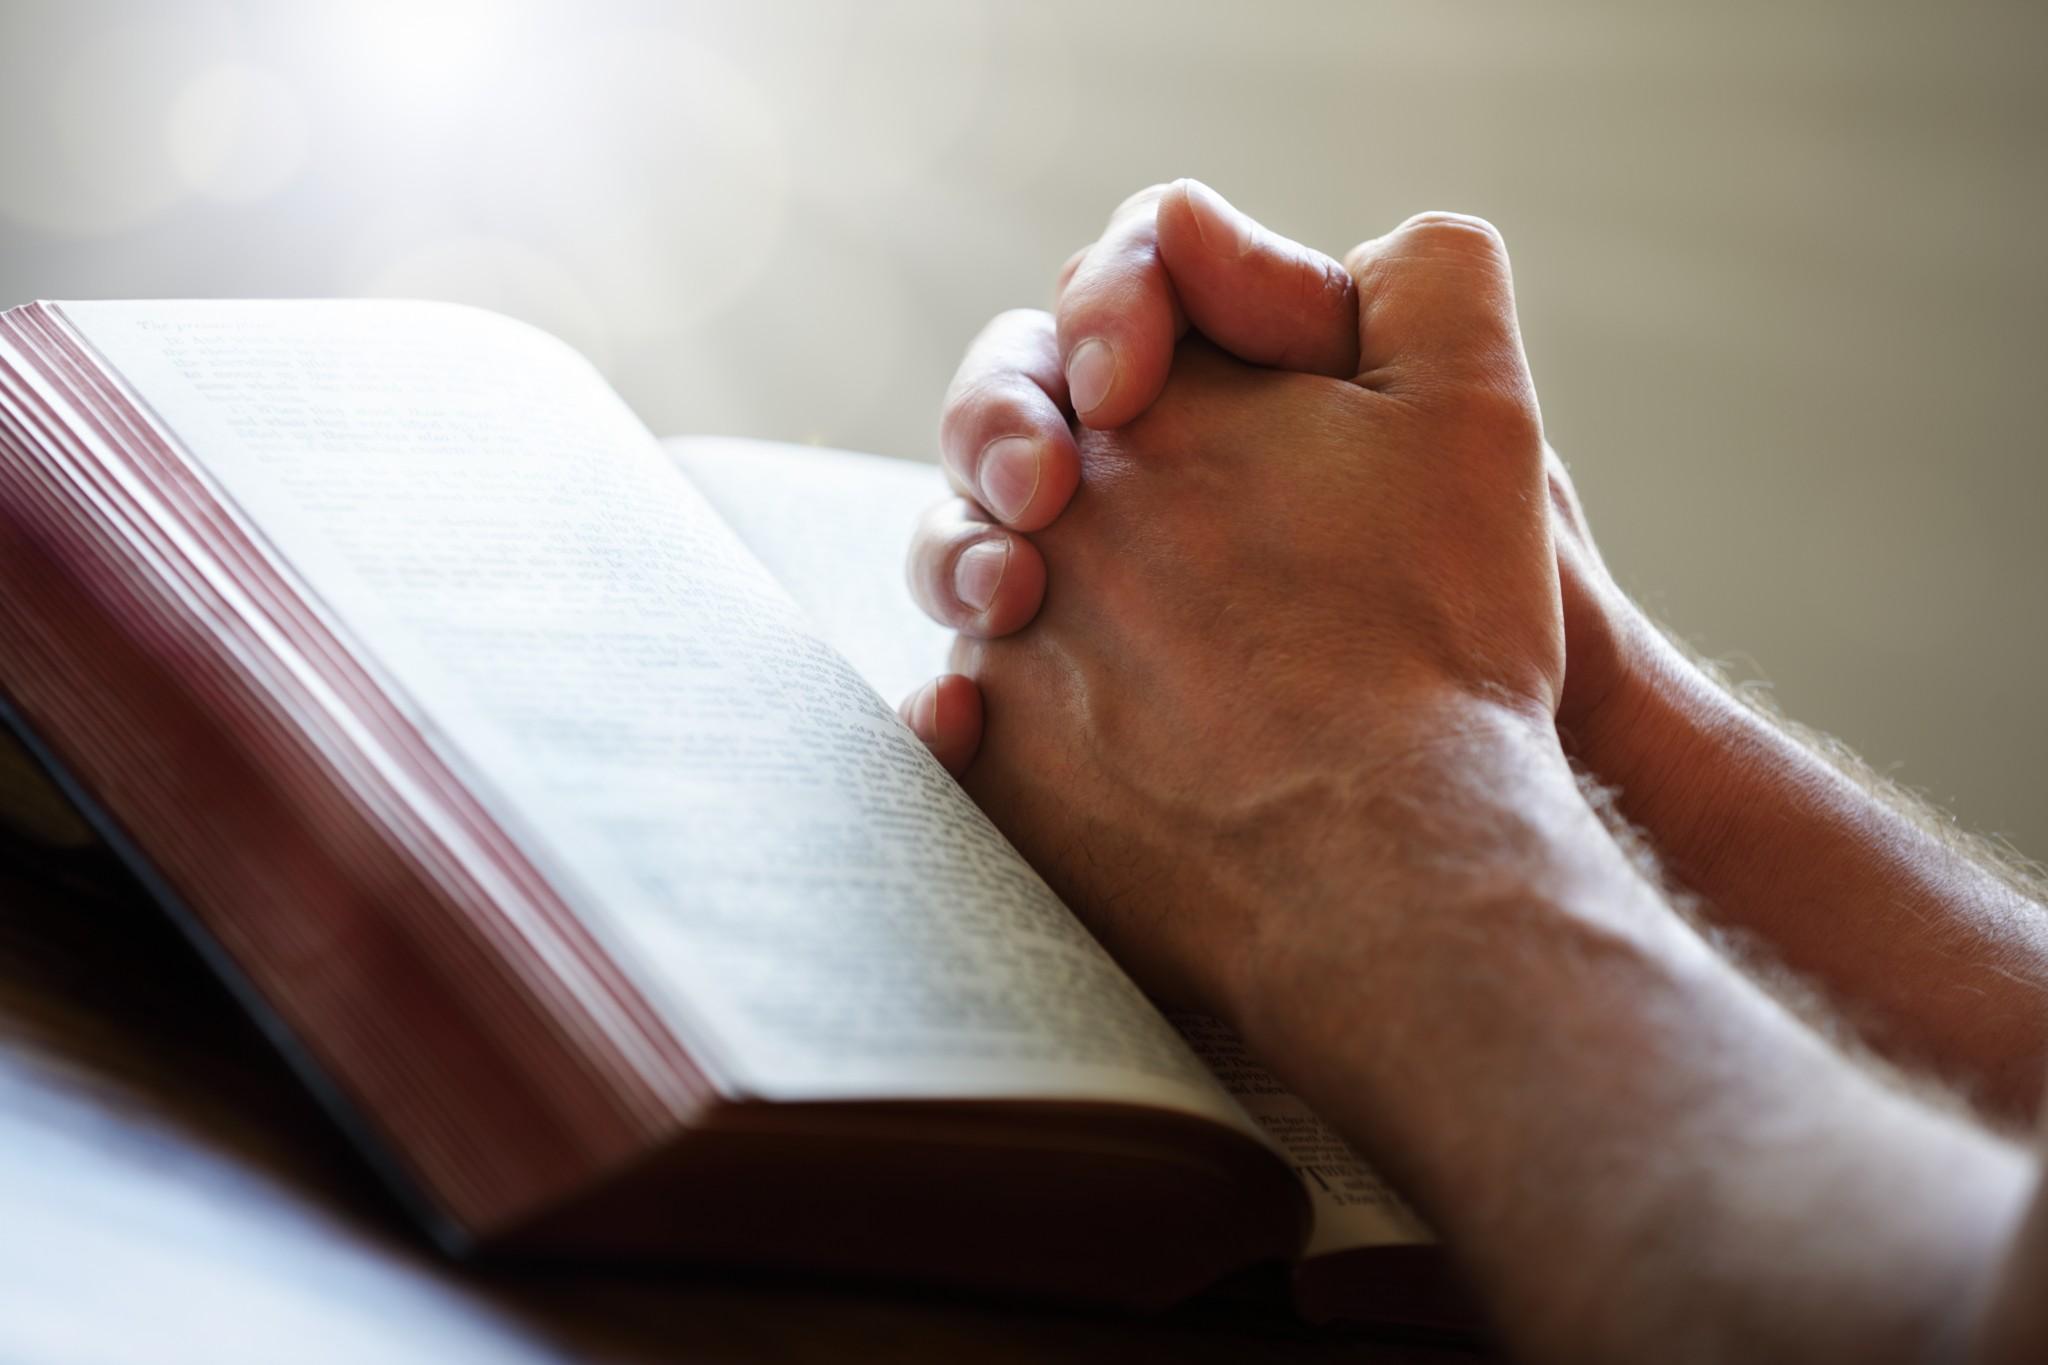 bigstock-Hands-folded-in-prayer-on-a-Ho-47921843